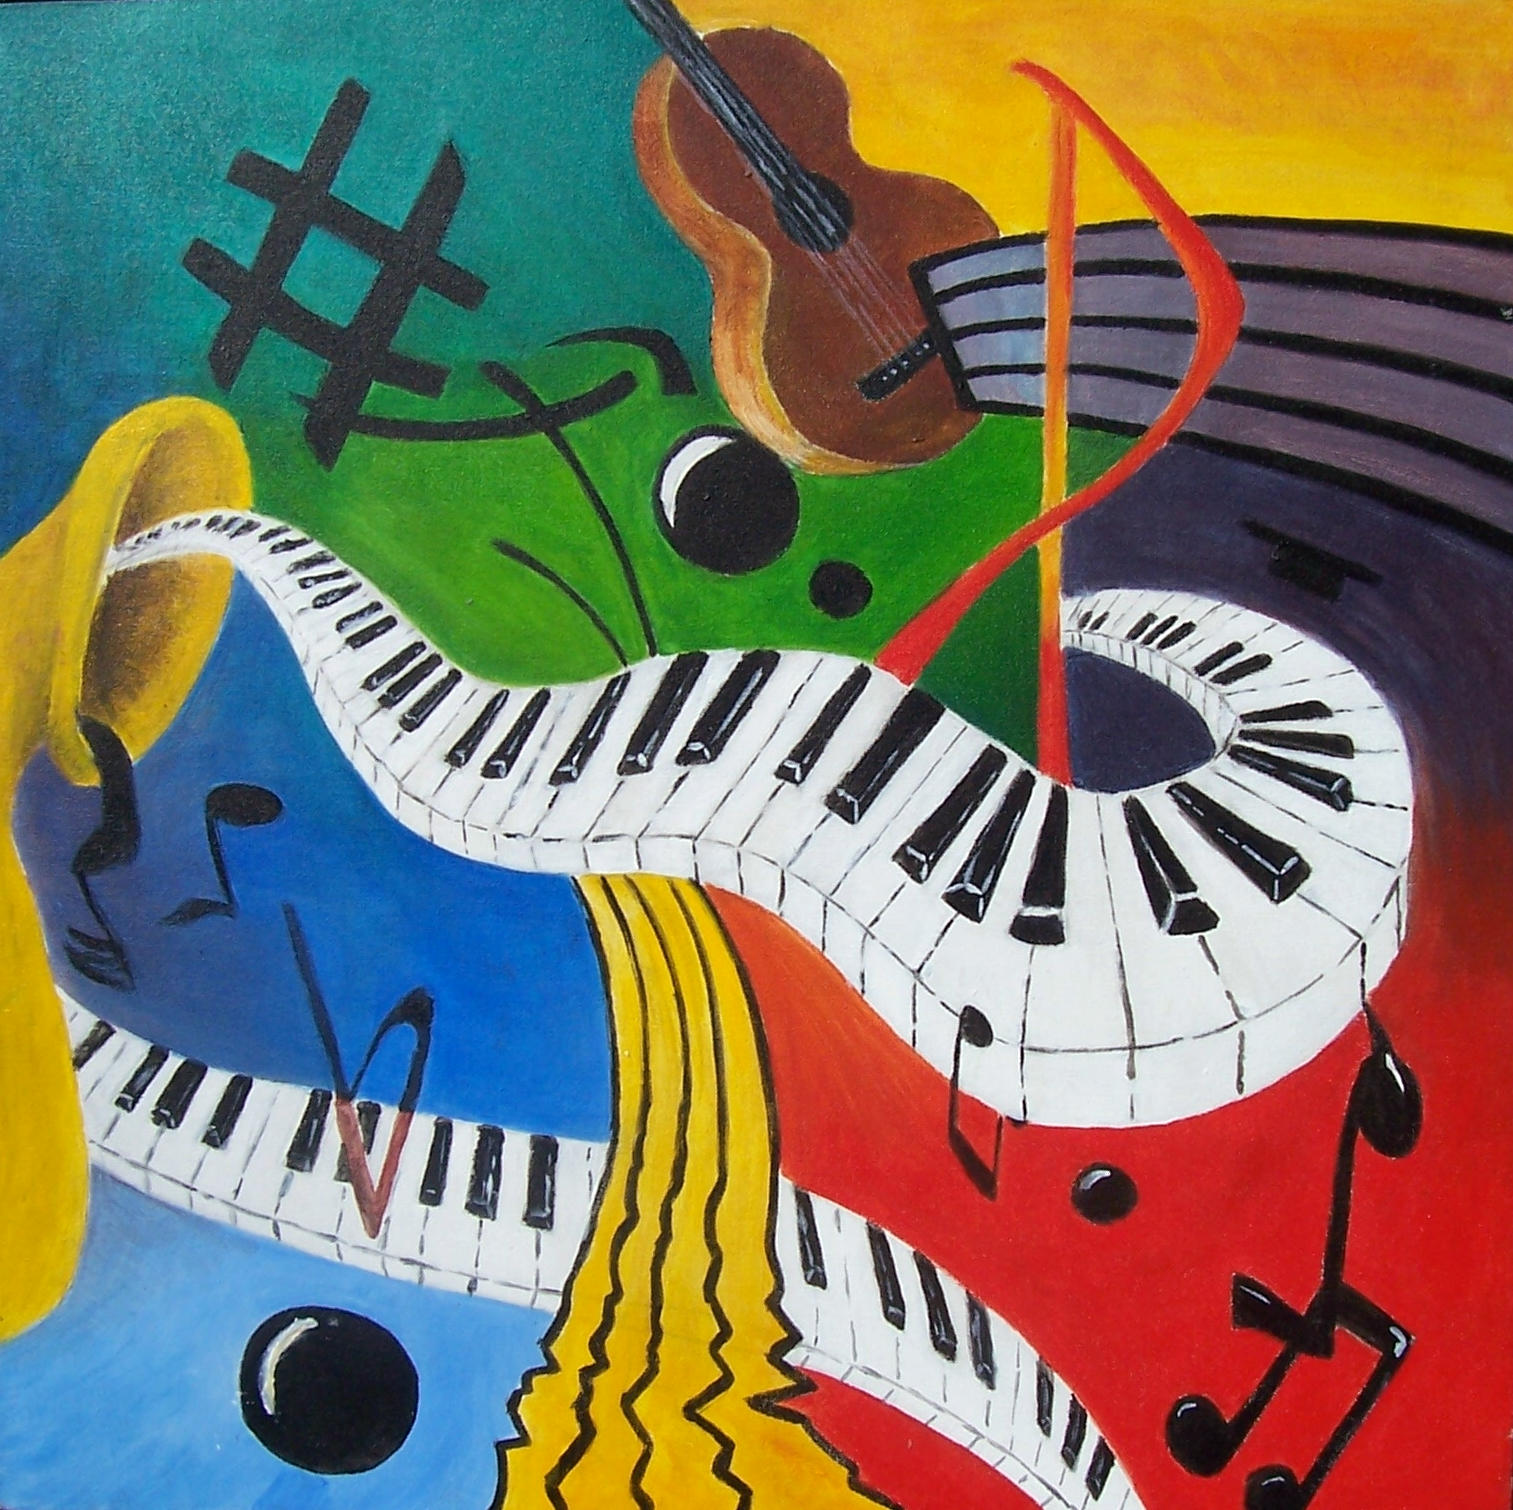 Musical Instruments by Clukyrat on DeviantArt